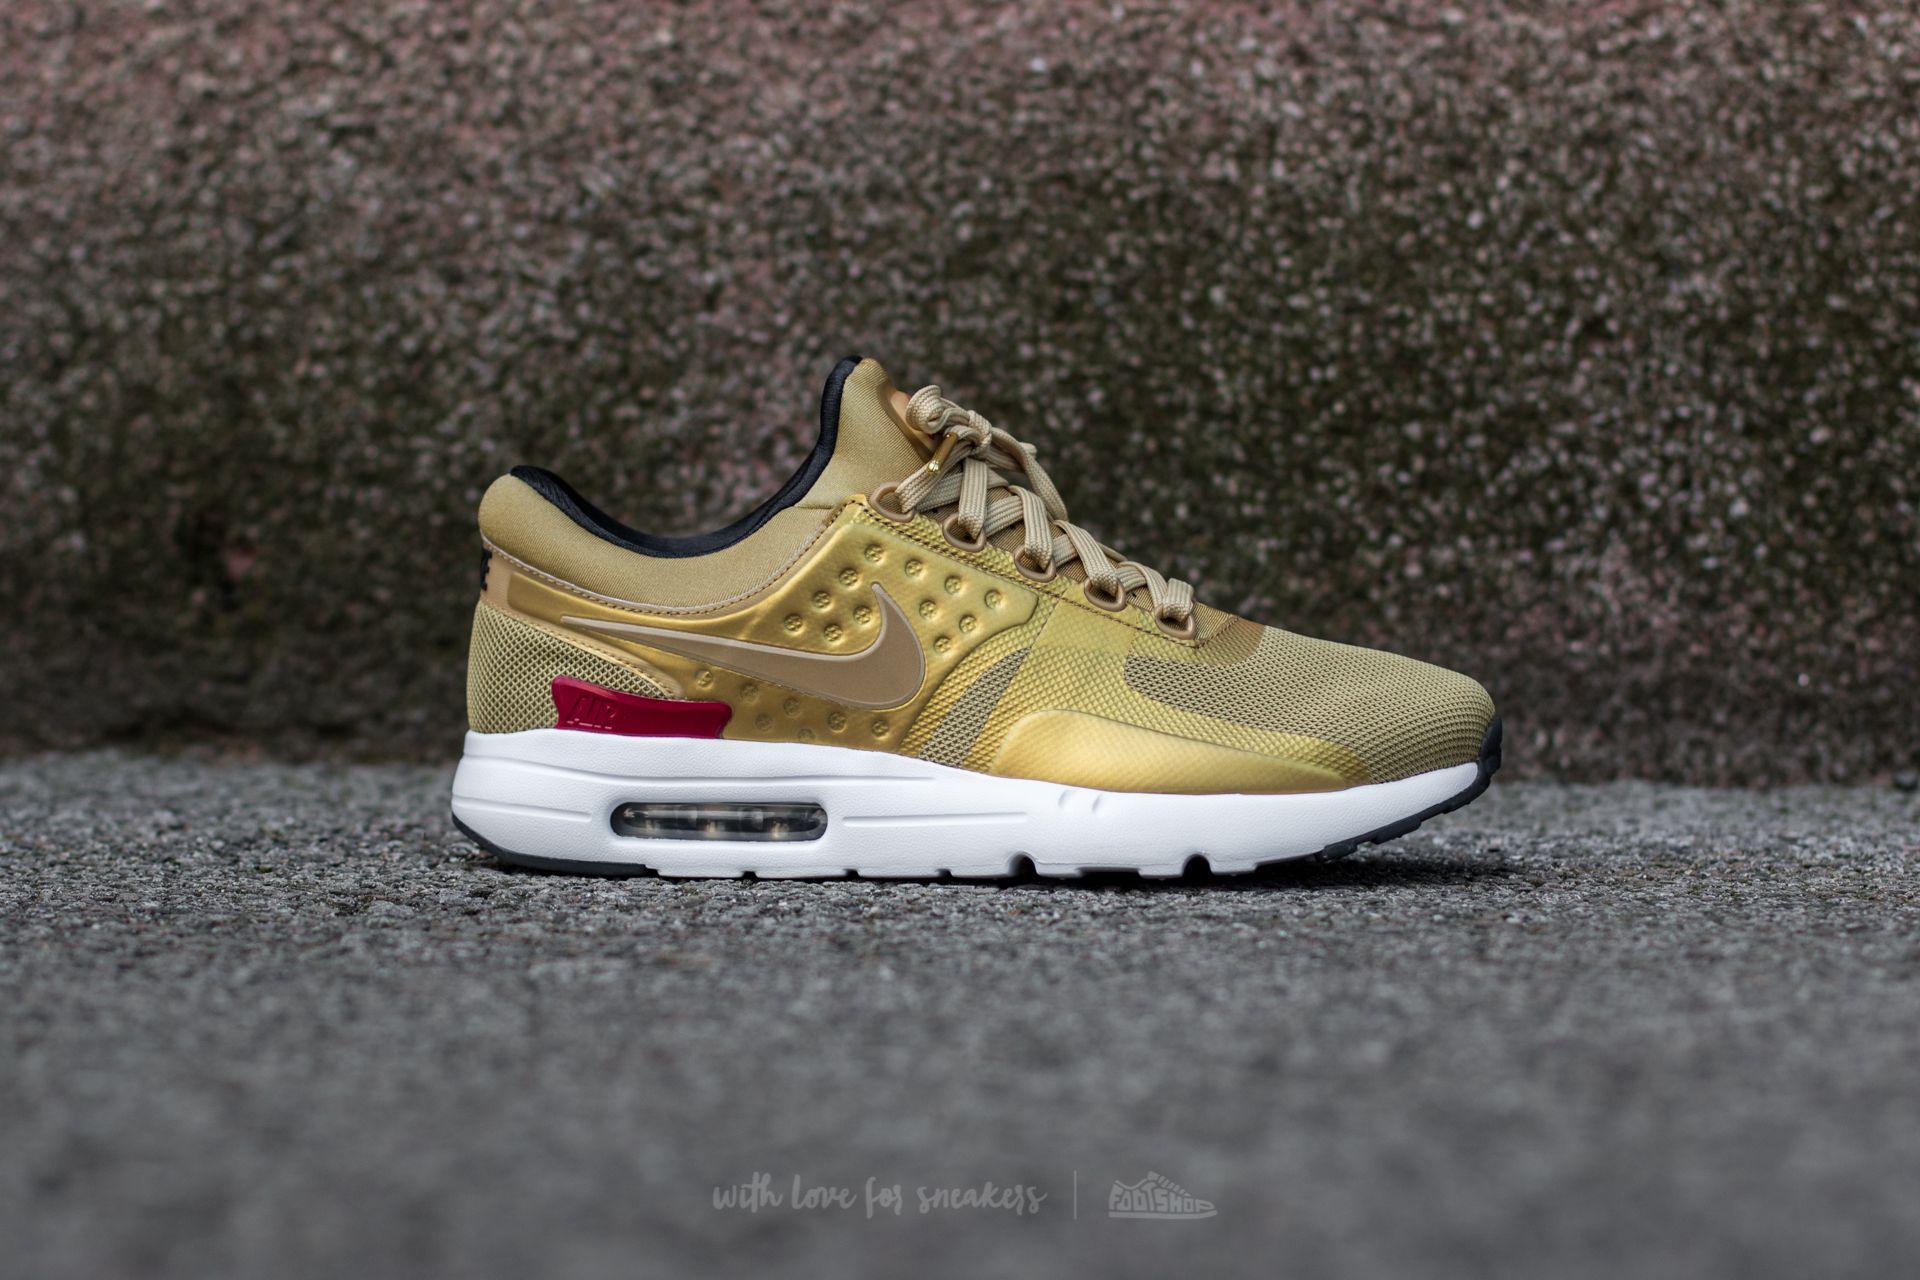 online retailer e4e5d 6750c Nike Air Max Zero Qs Metallic Gold  Varsity Red in Metallic for Men ...